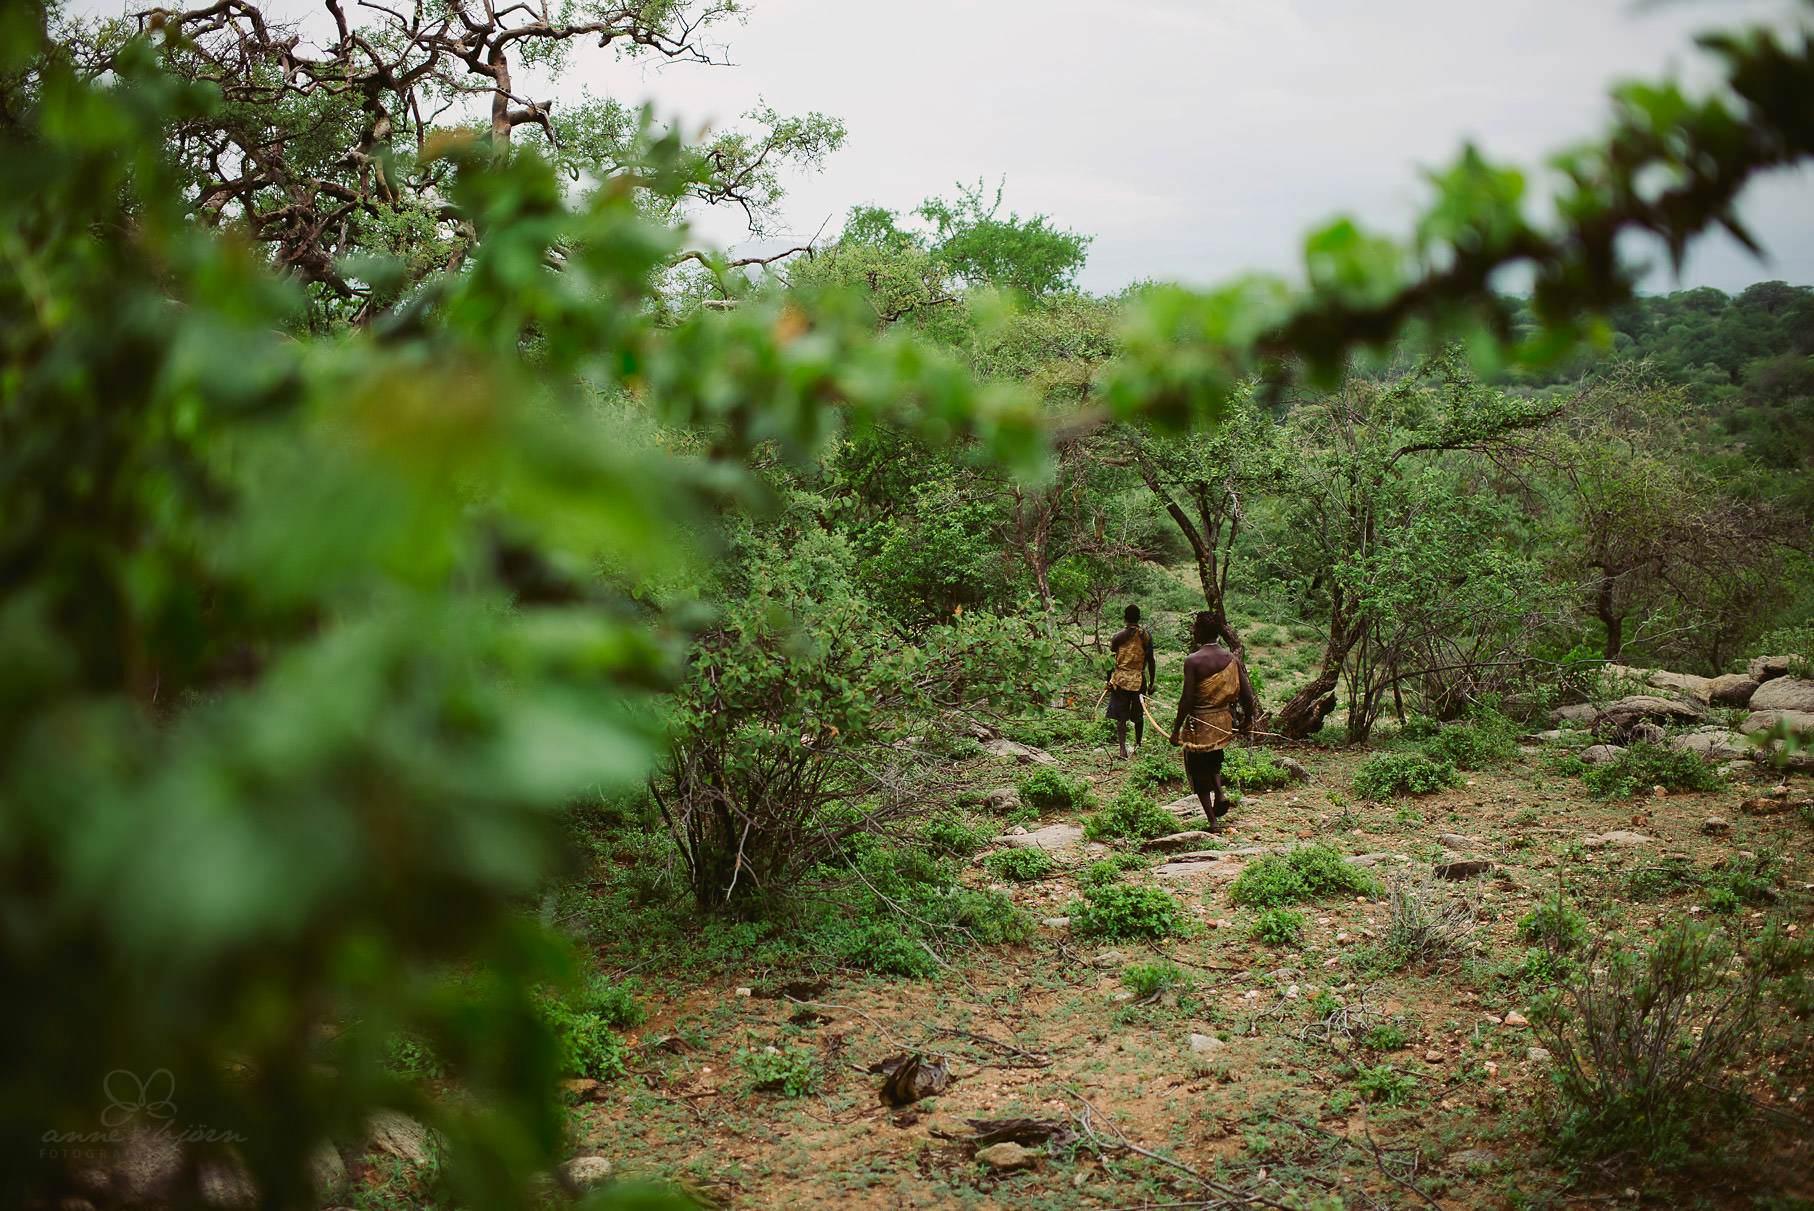 0068 tansania nd8 1908 anne bjoern fotografie hochzeitsfotograf hamburg - This is Tanzania - Serengeti, Kilimanjaro & Sansibar